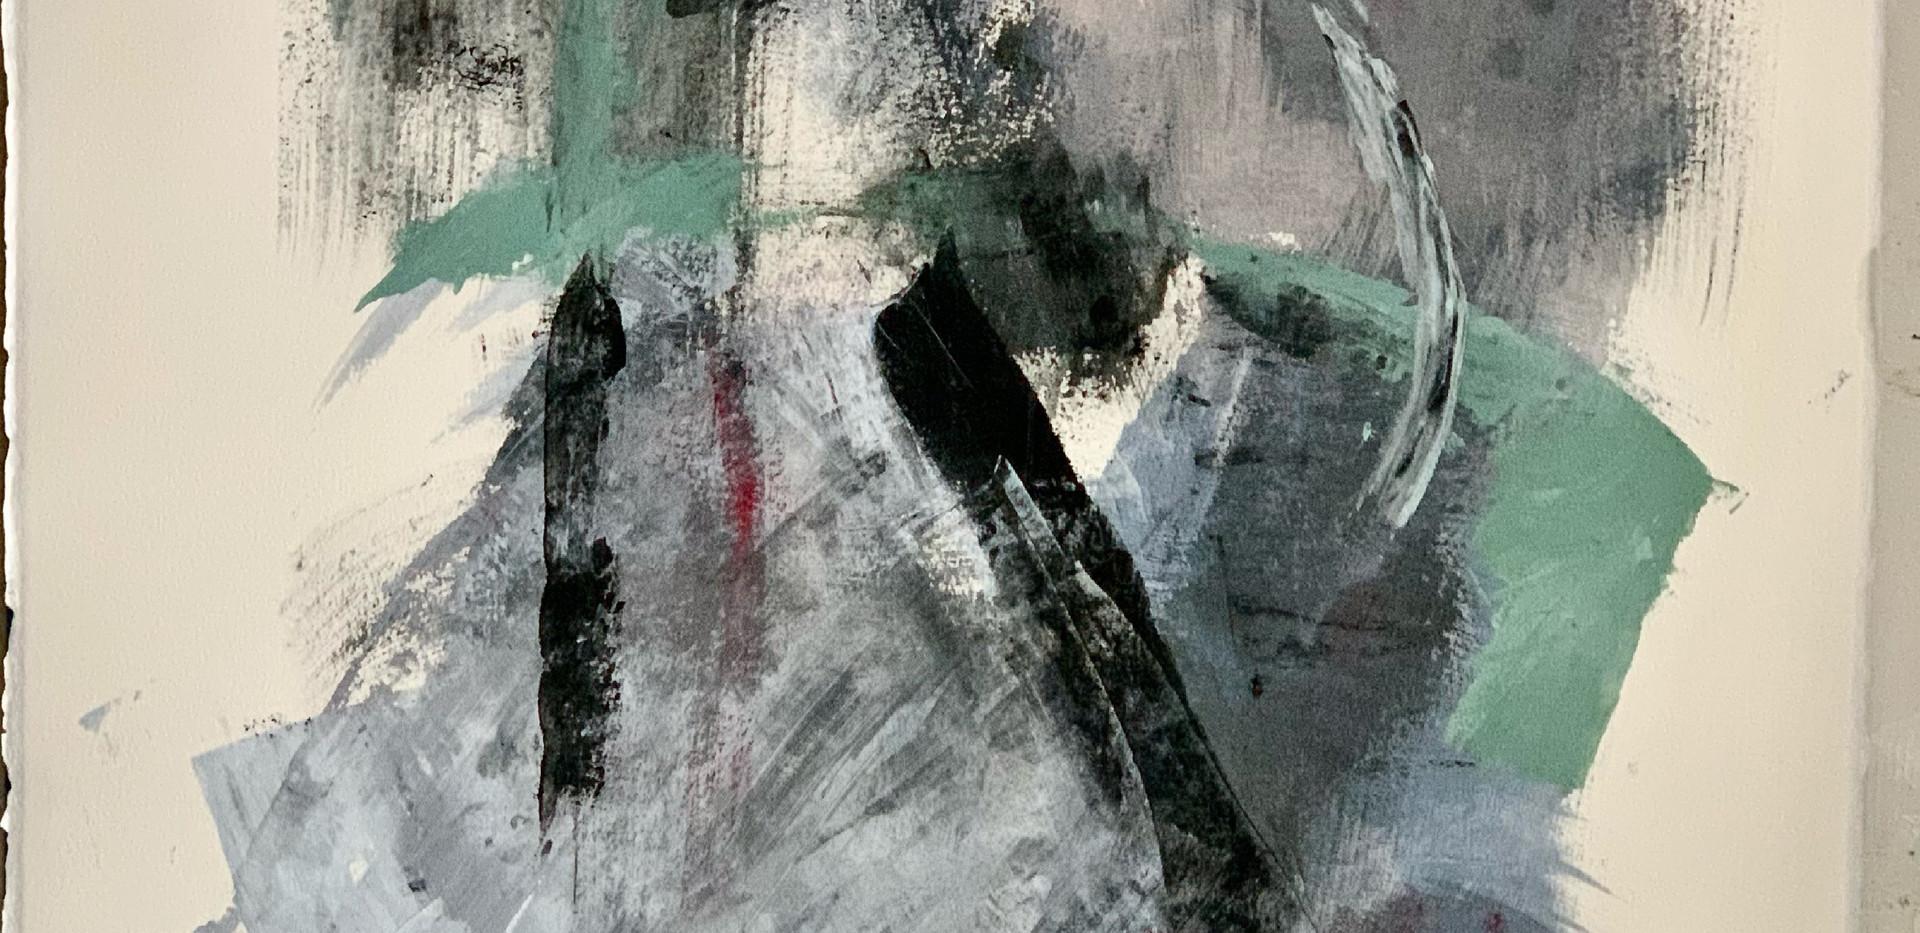 turbulent